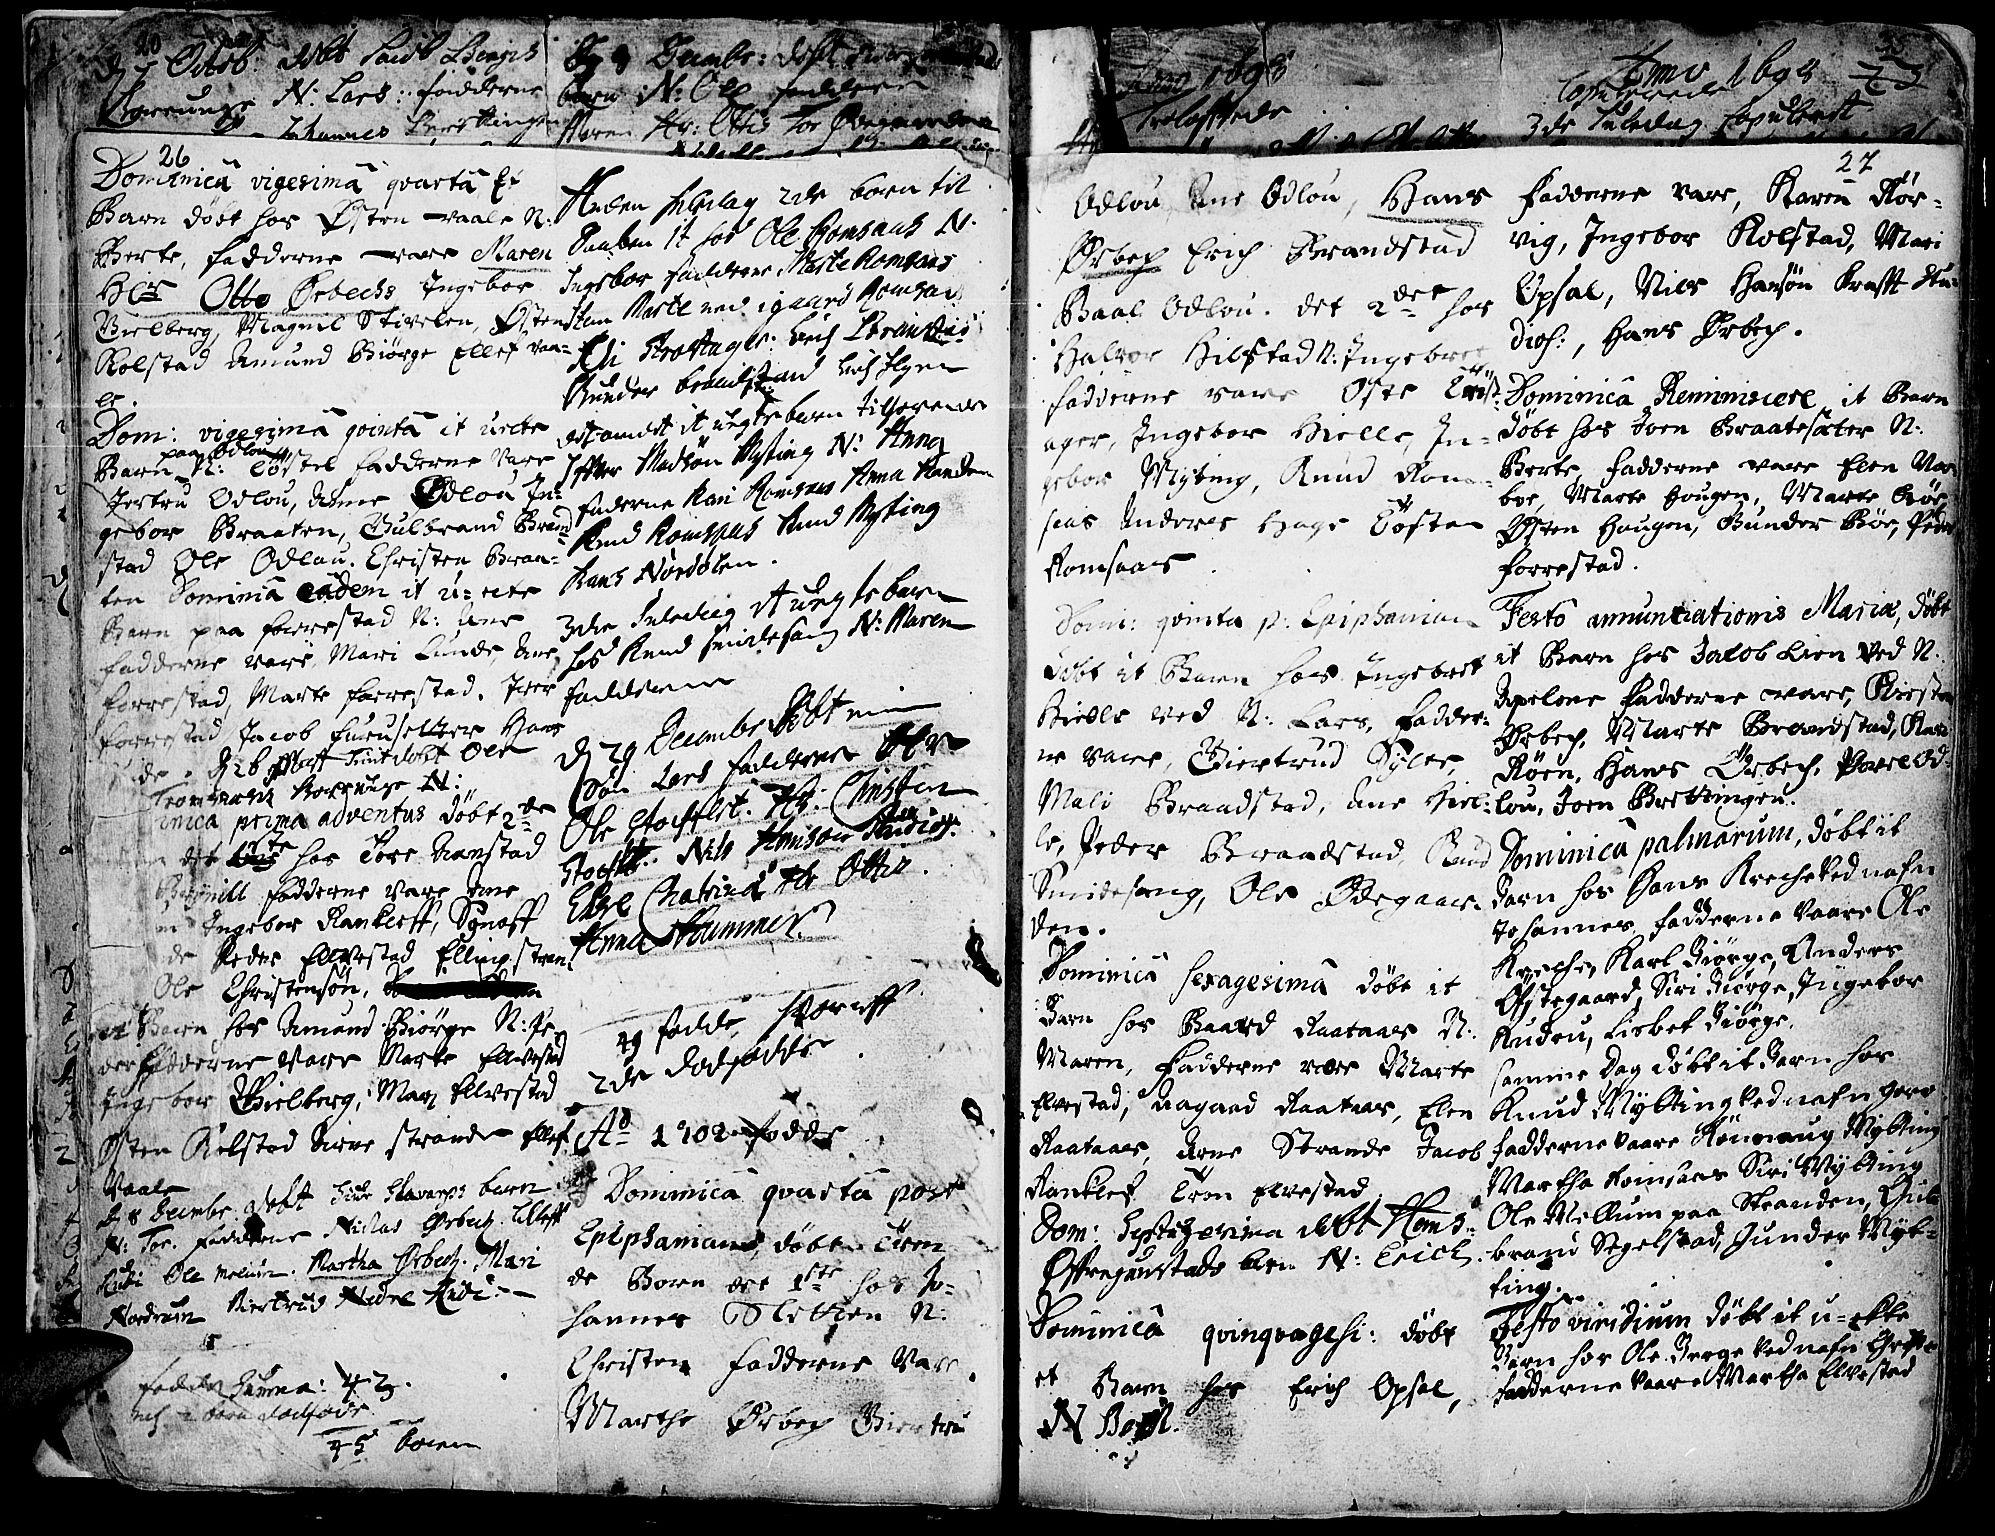 SAH, Ringebu prestekontor, Ministerialbok nr. 1, 1696-1733, s. 26-27